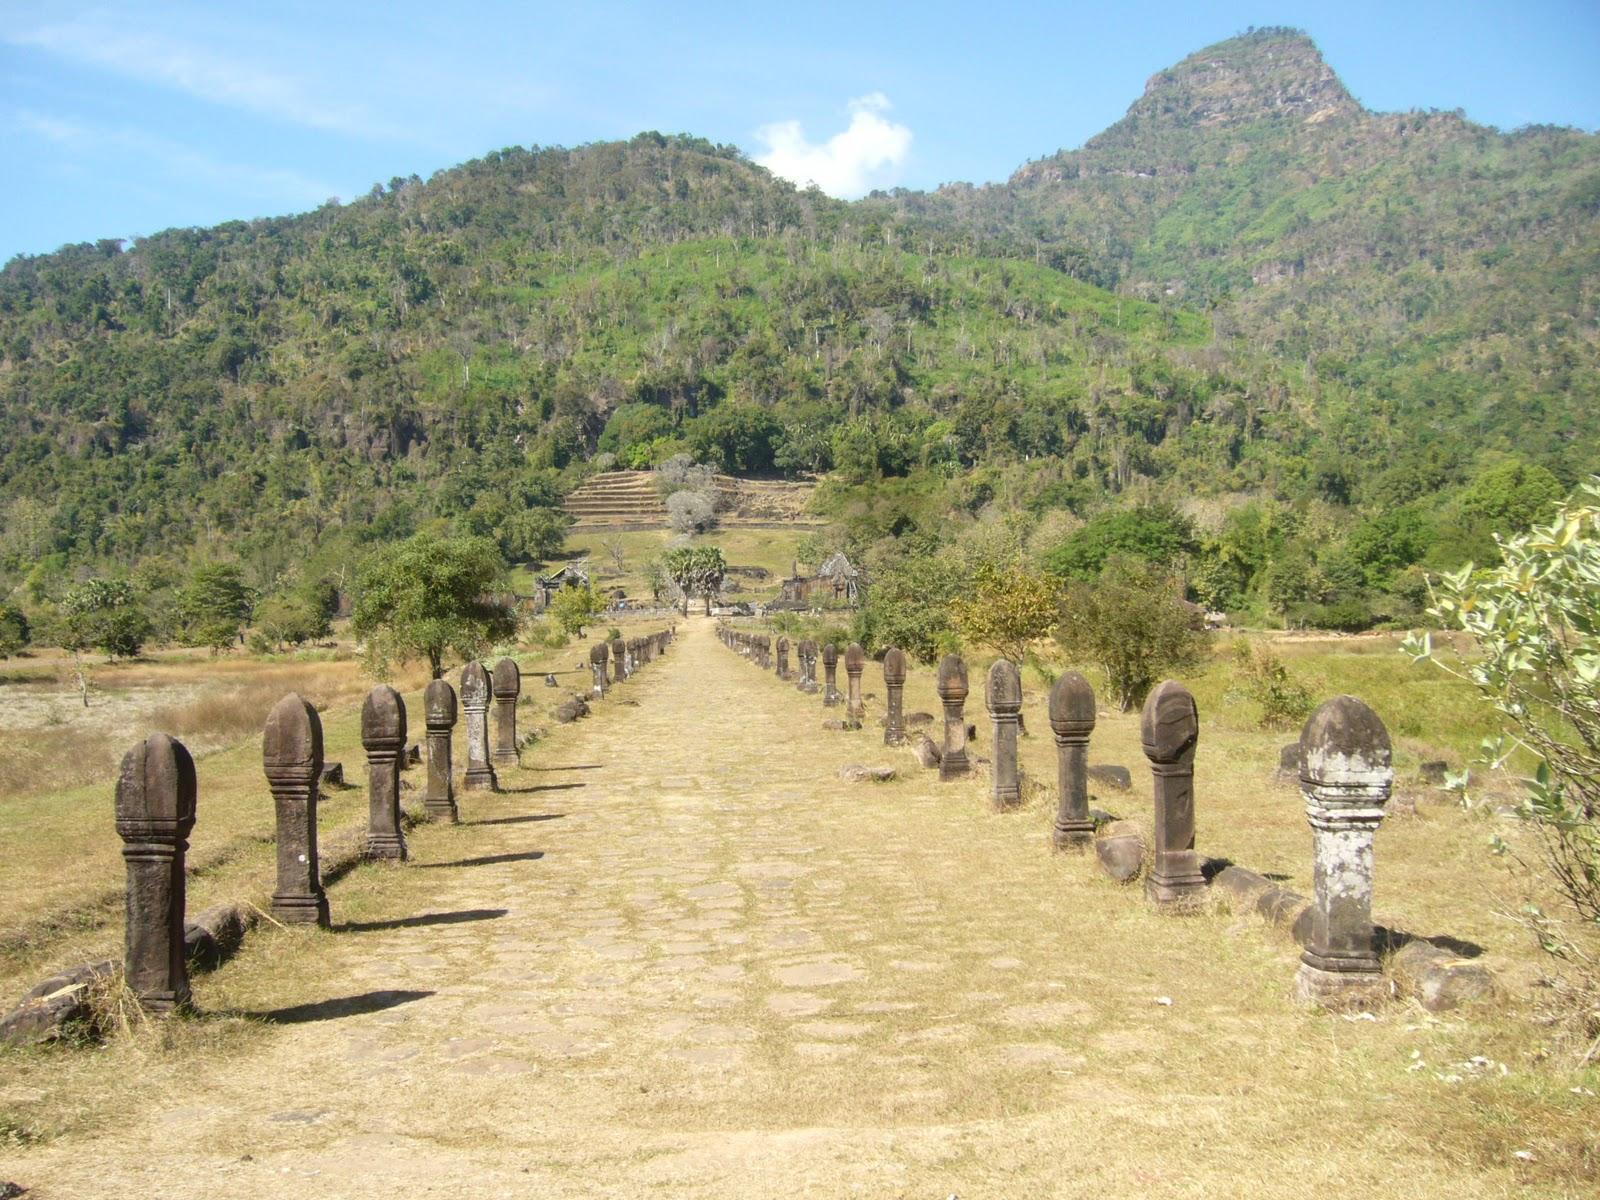 Champasak Laos  city pictures gallery : Southeast Asia Studies: Prasat Phnom Vat Phu, Champasak, Laos